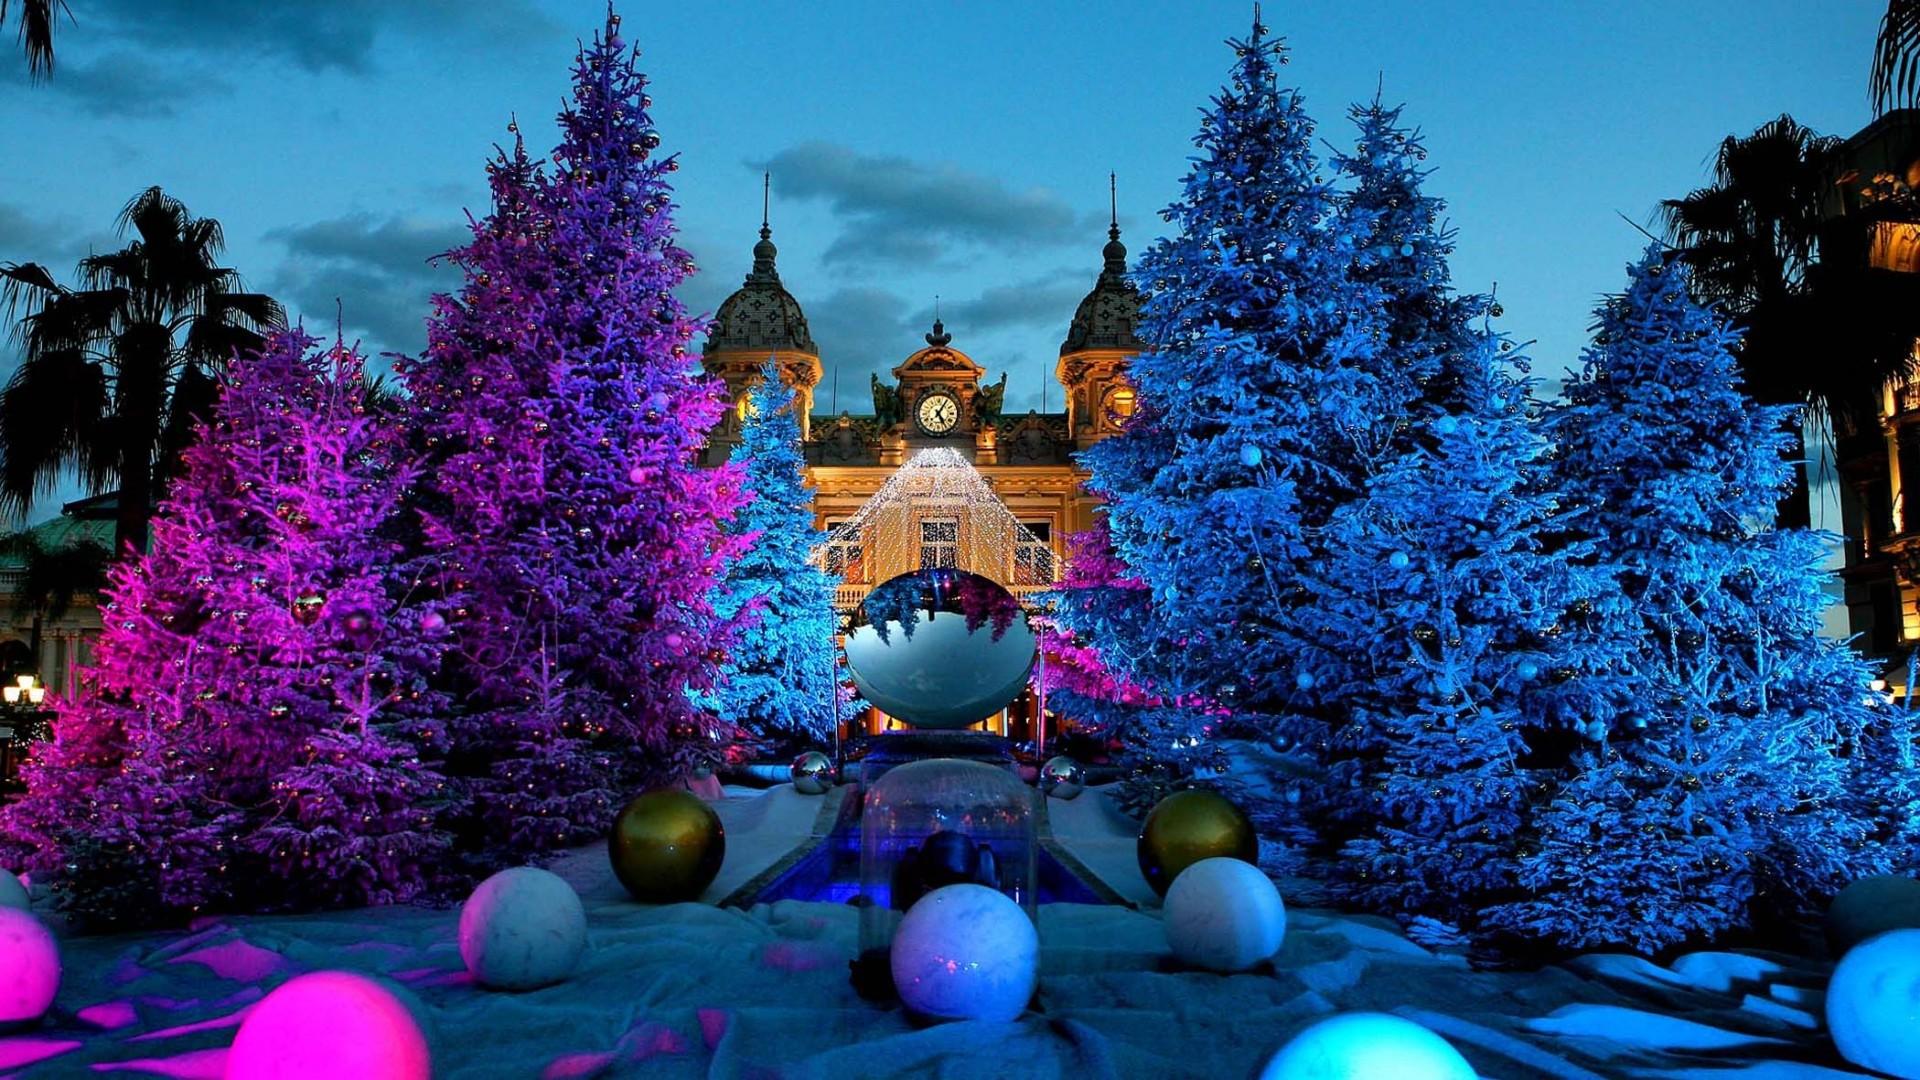 … Background Full HD 1080p. Wallpaper christmas tree, casino,  monte carlo, monaco